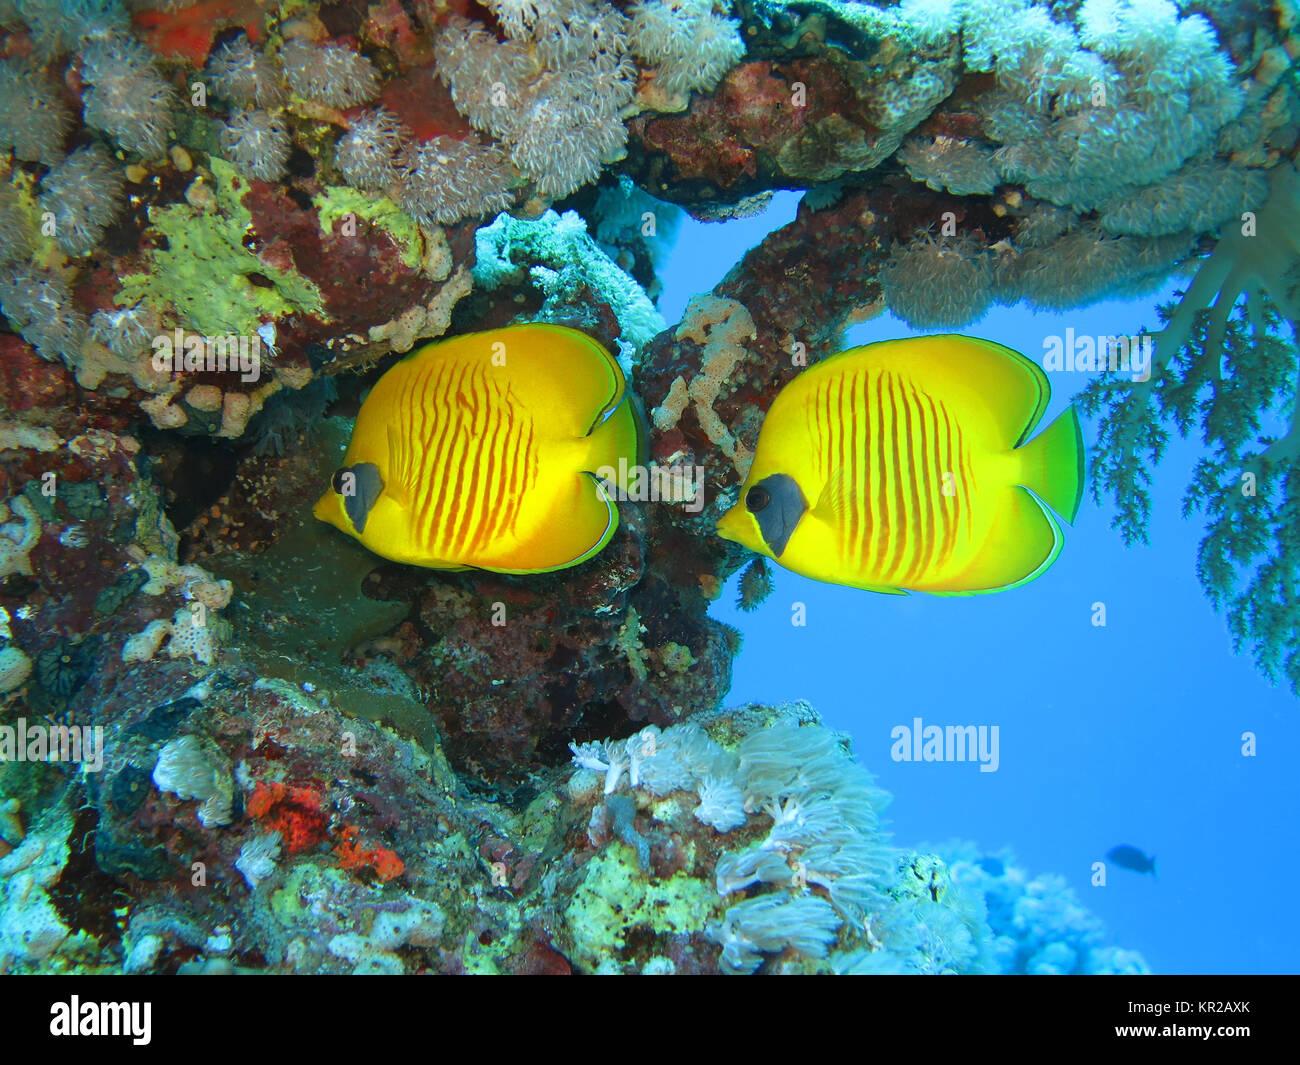 Masks-butterfly's fish Chaetodon semilarvatus, Saint John?'s reef, the Red Sea, Egypt / Egypt, Masken-Falterfische - Stock Image